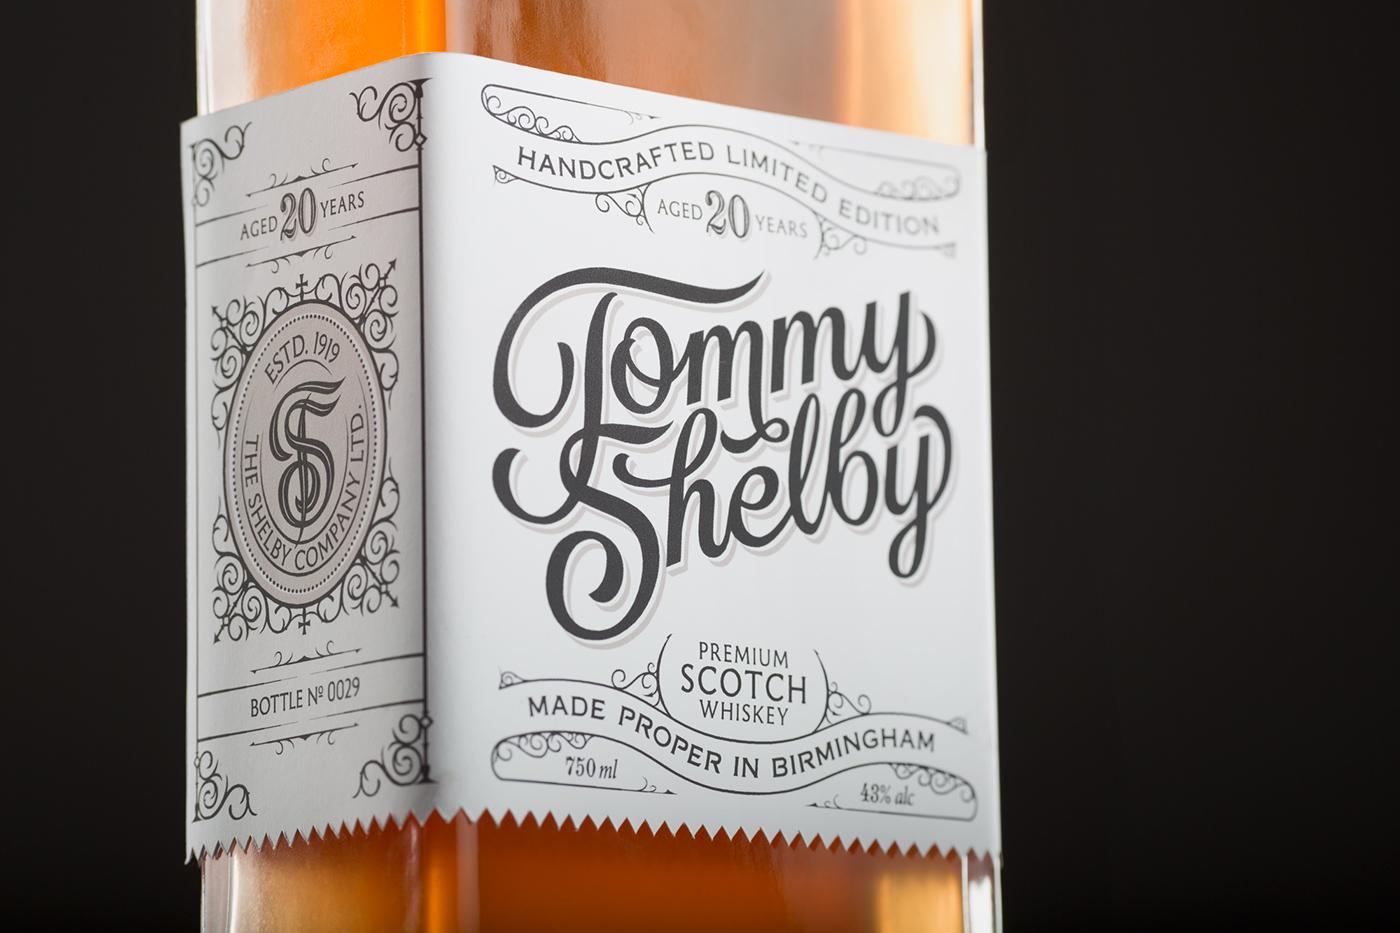 tommy shelby Peaky Blinders Whiskey package design  bottle design label design adaa_2015 adaa_school arizona_state_university adaa_country united_states adaa_packaging